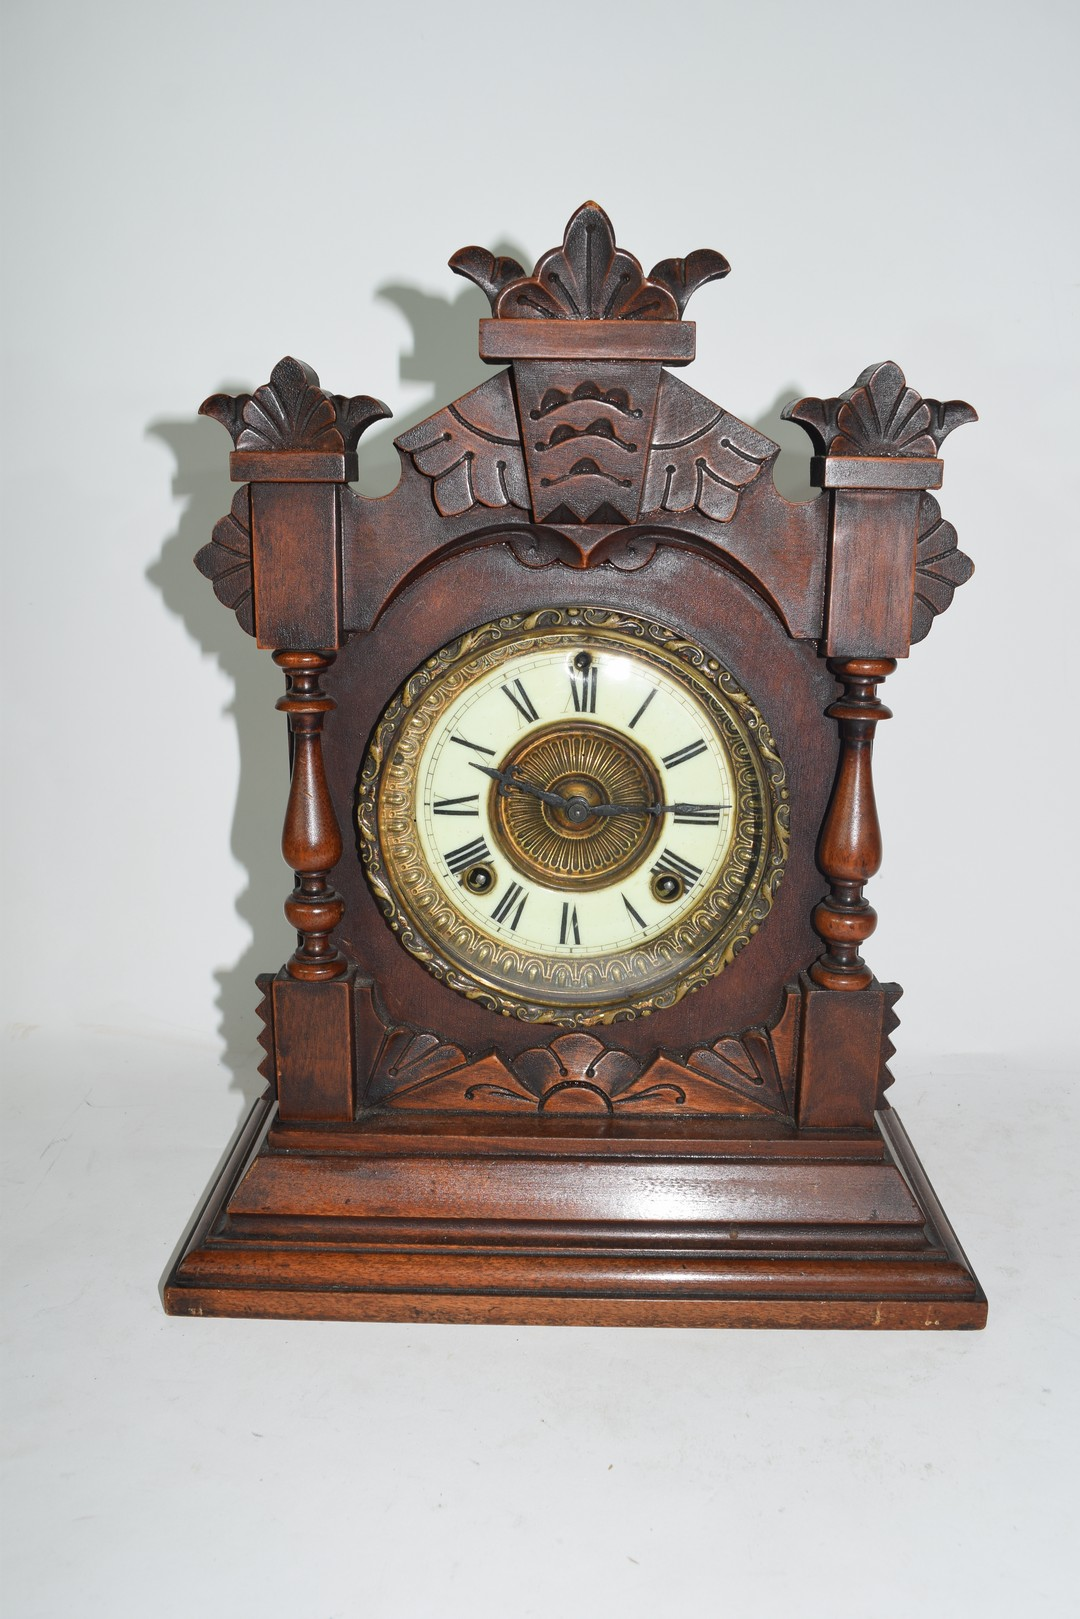 Late 19th century mantel clock by Ansona of New York